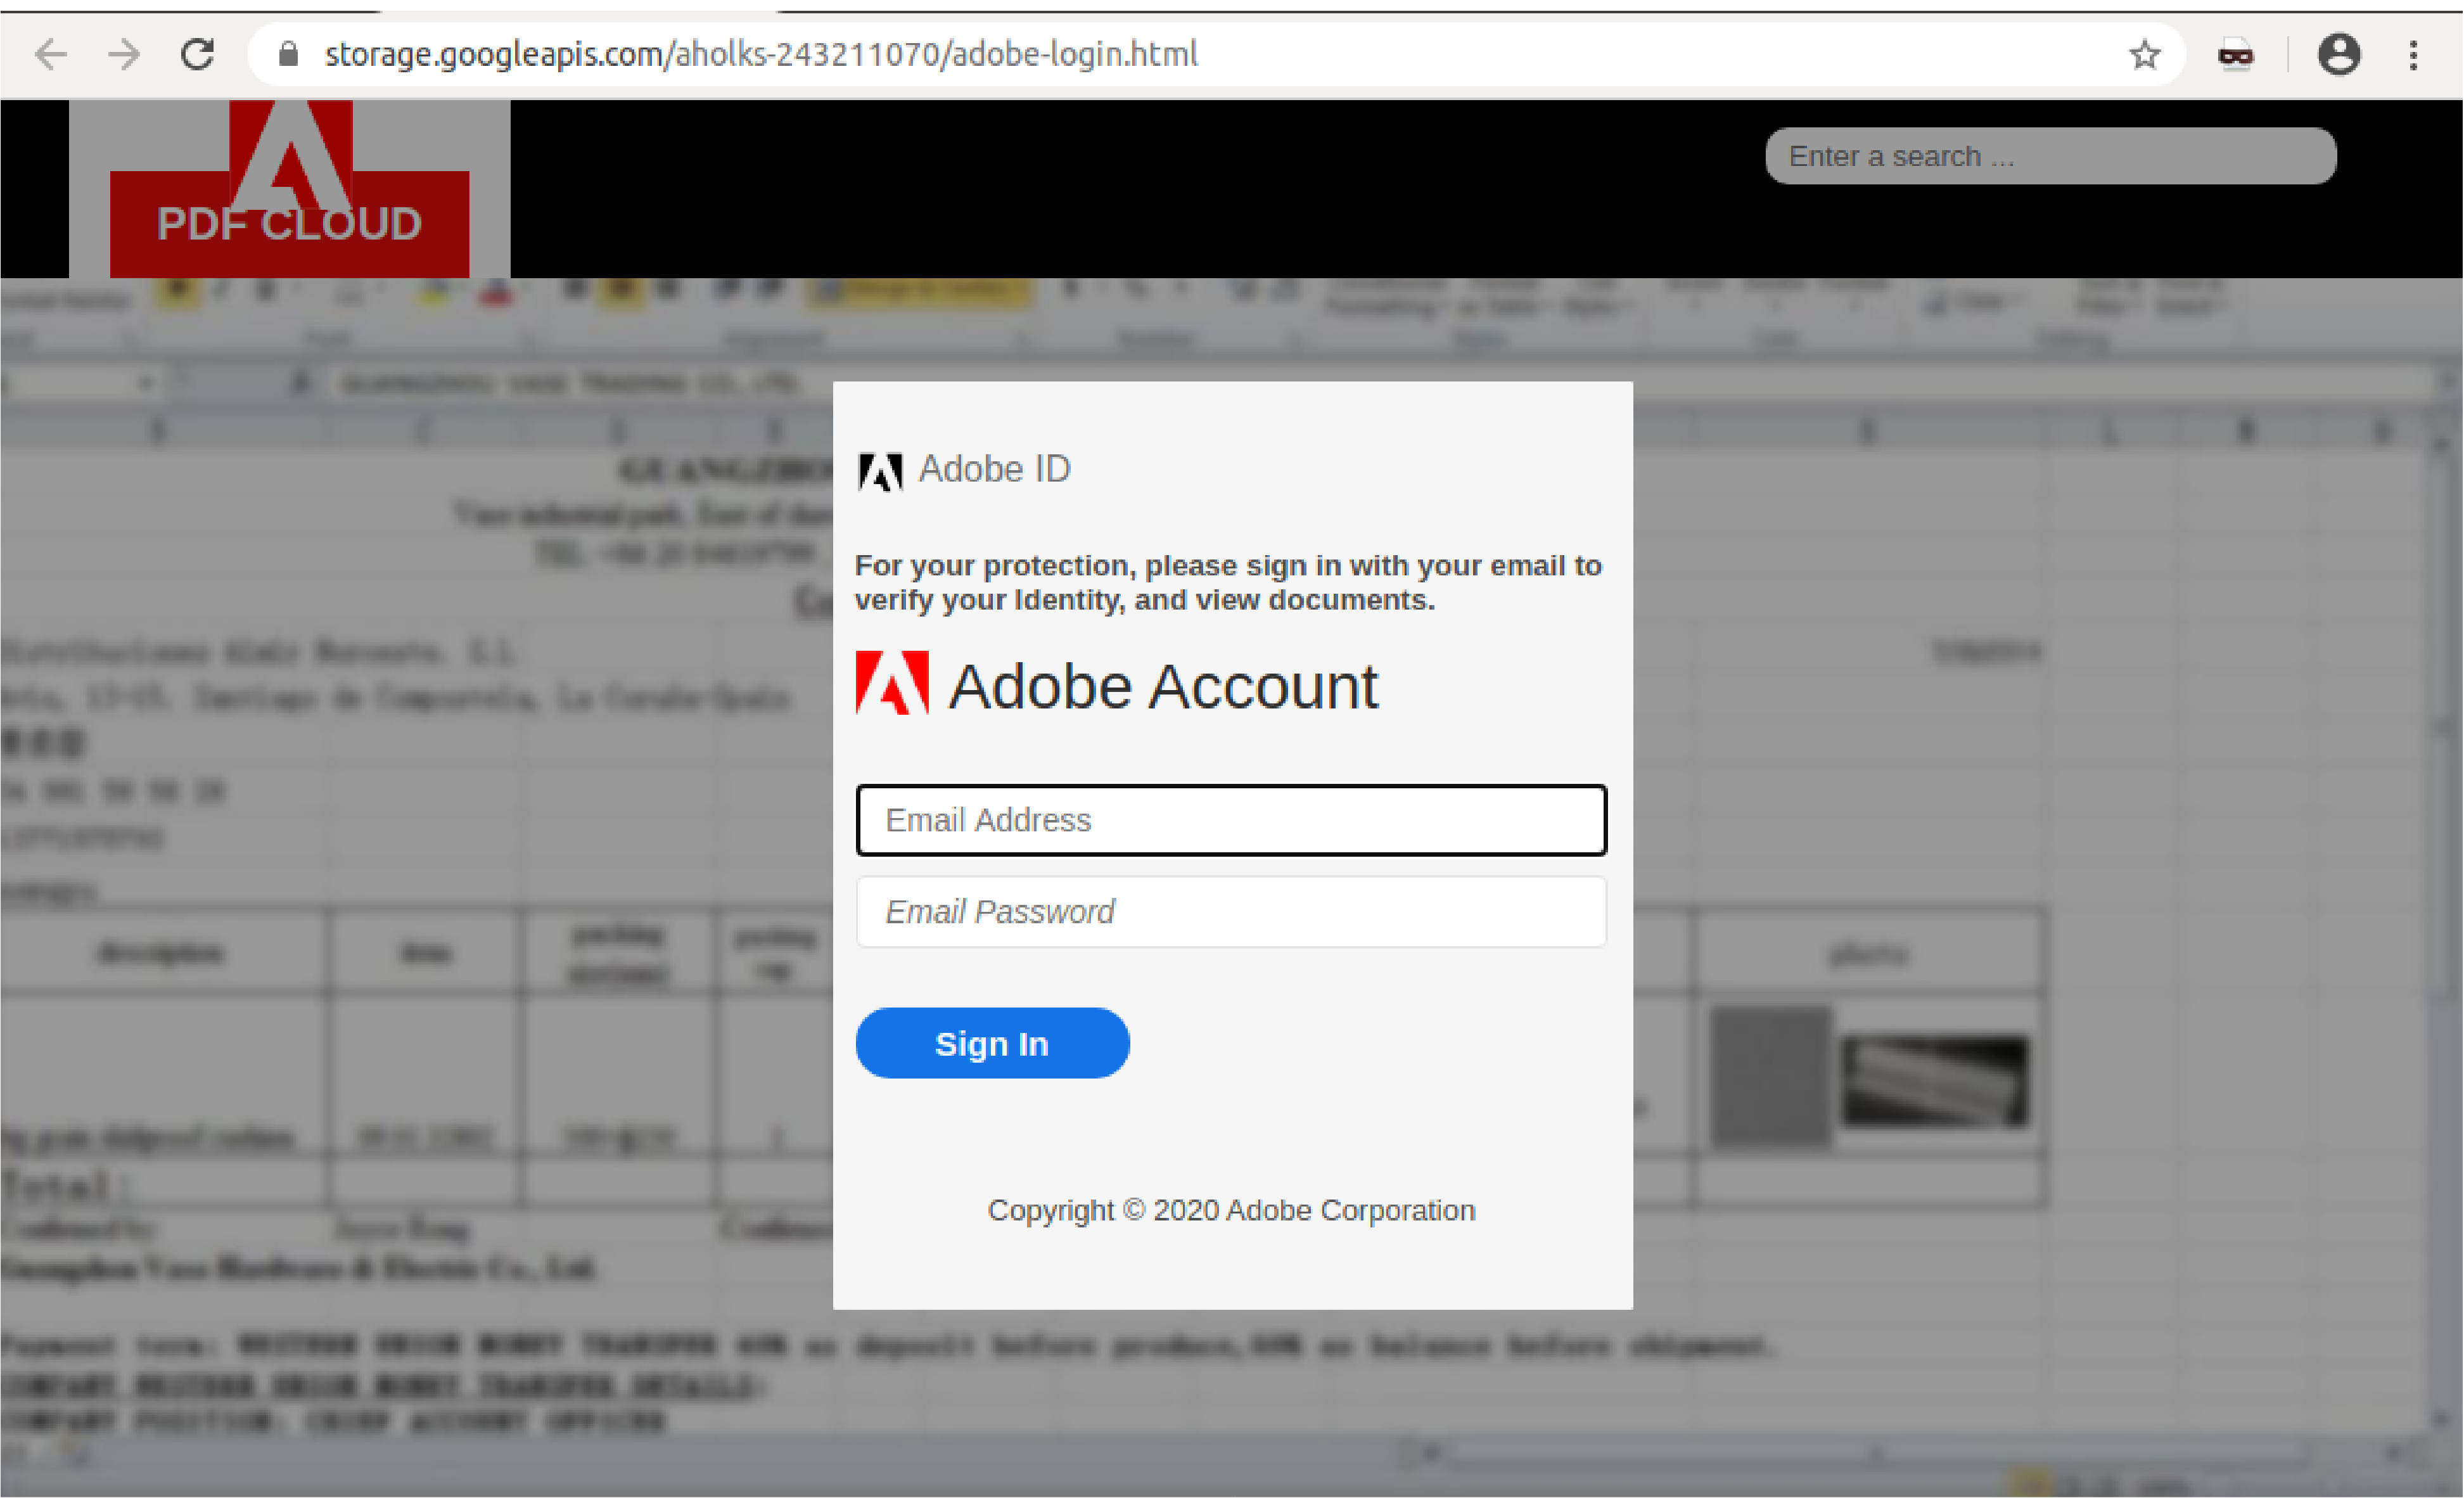 Adobe Image 3-01